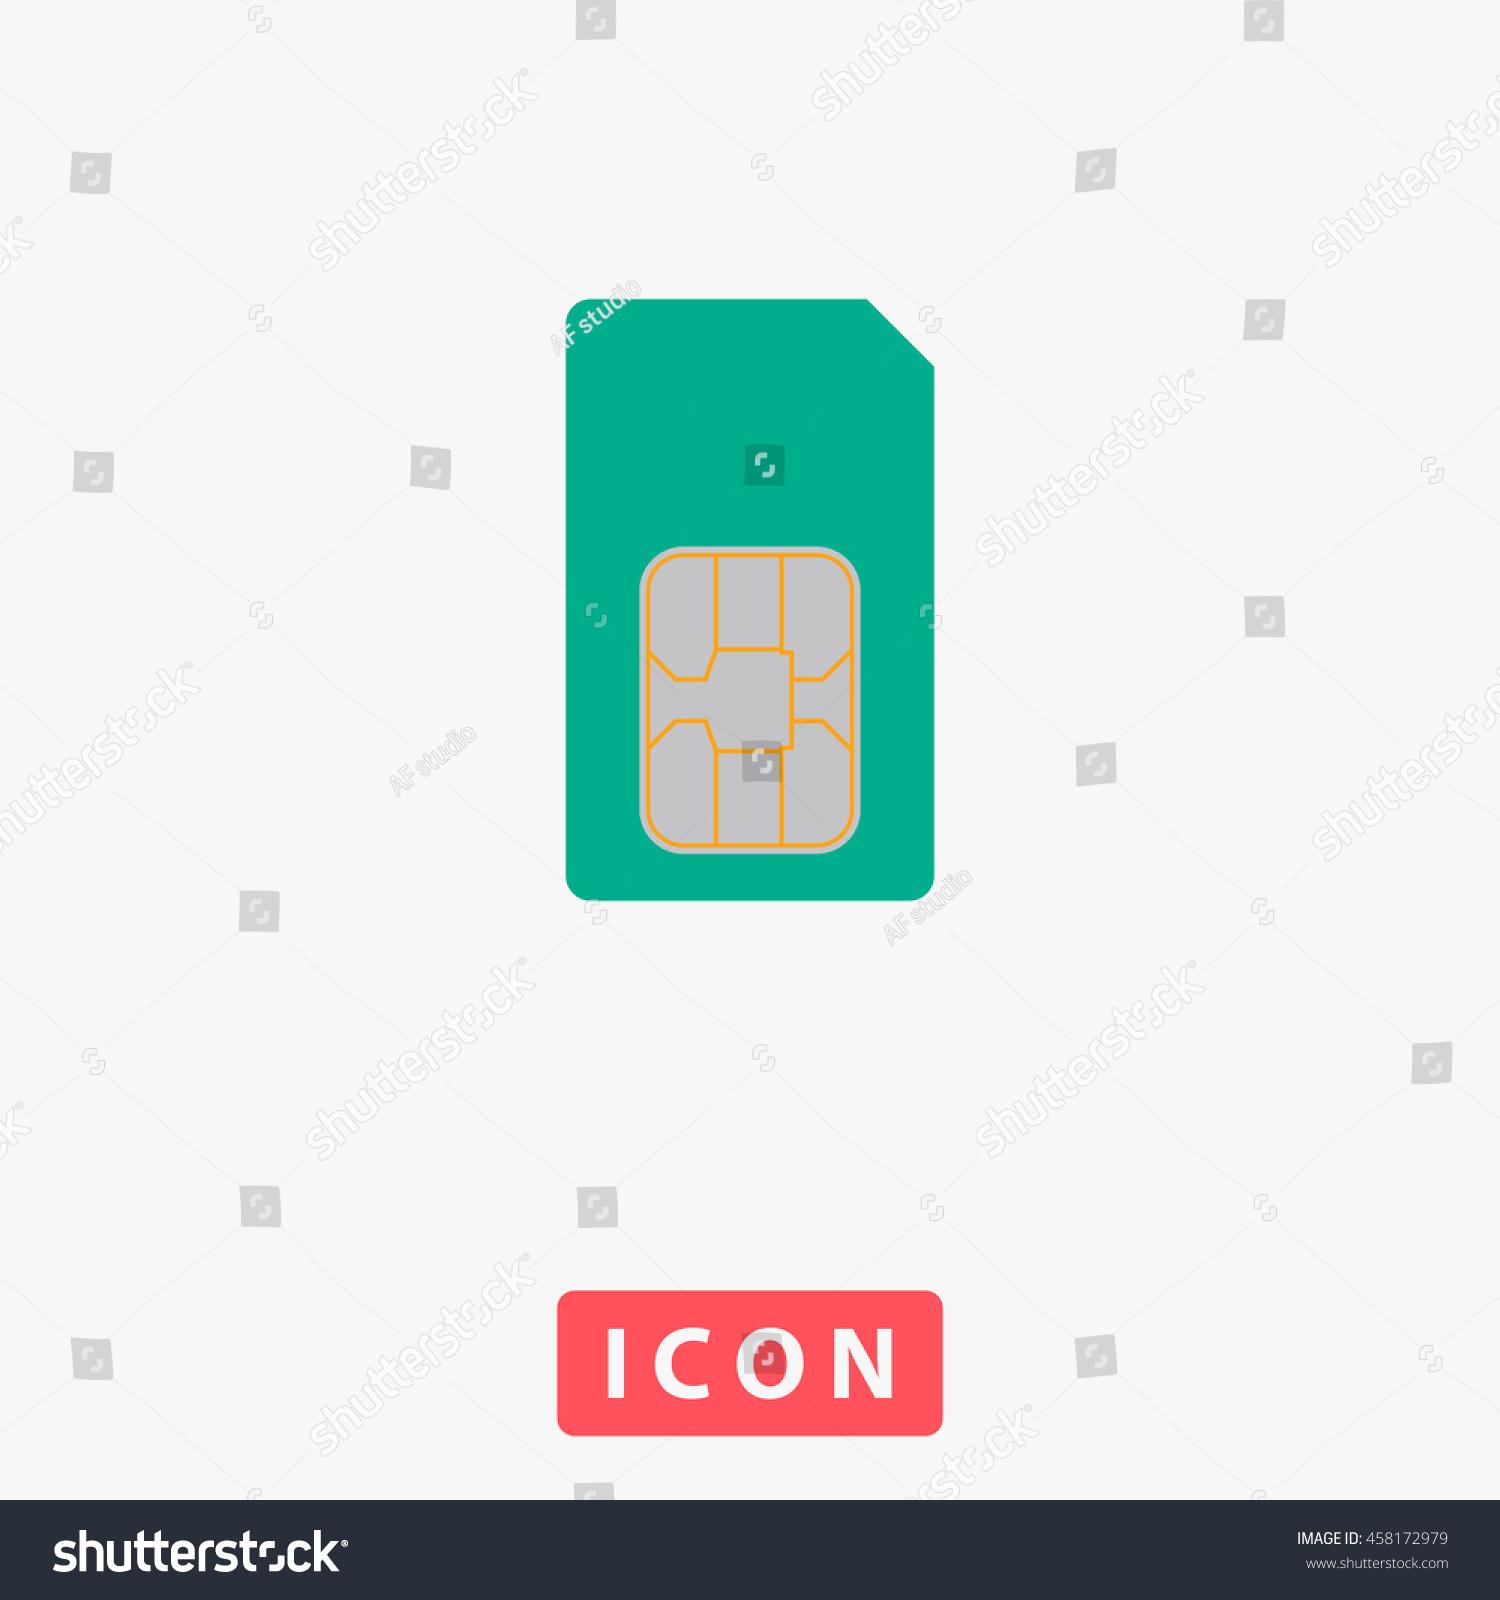 Sim Card White Circle Button On Stock Illustration - Royalty